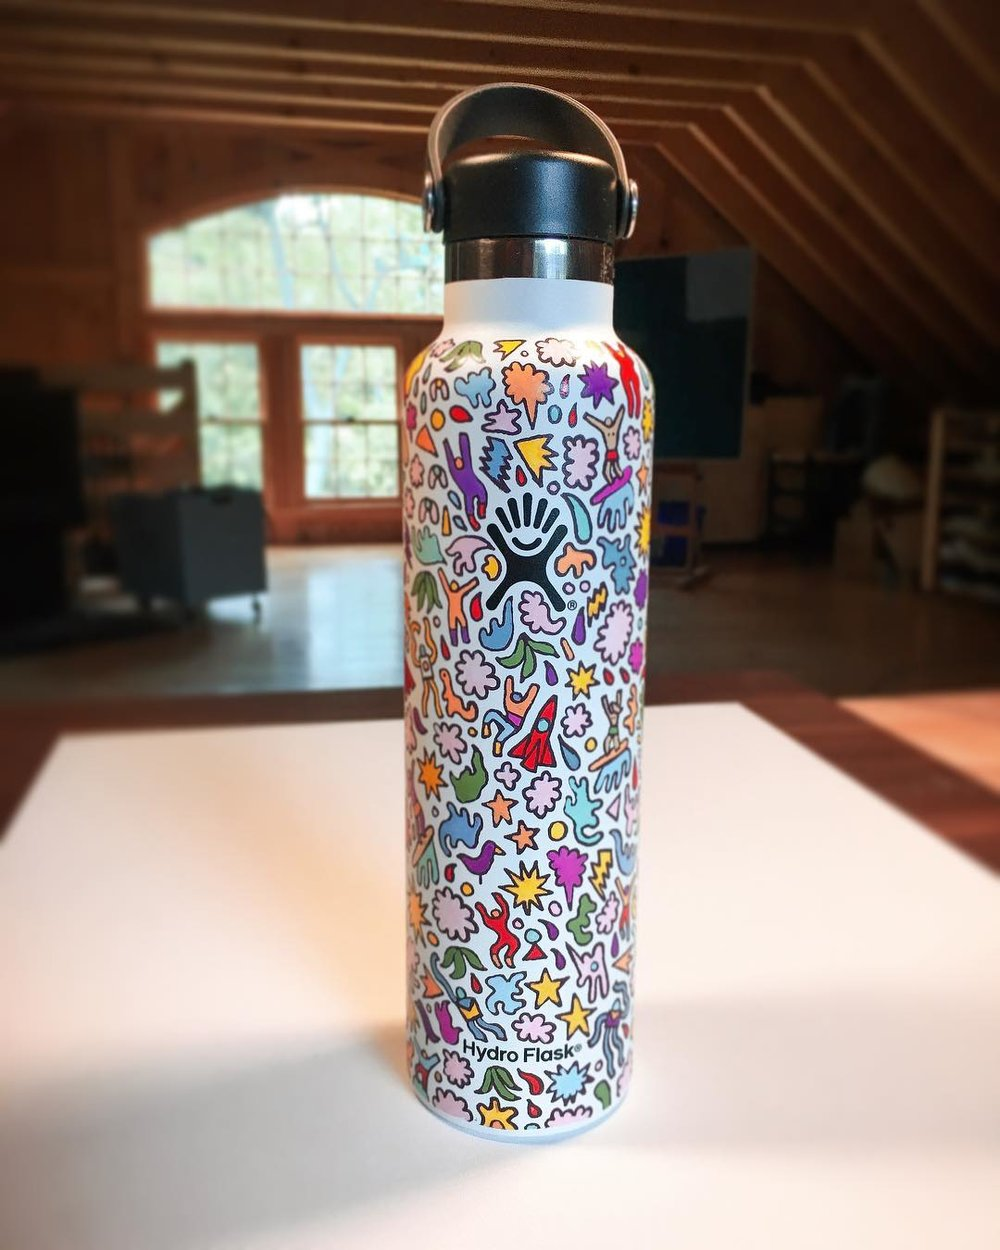 Always bring an empty reusable water bottle. - Beau Berman, Tripcents